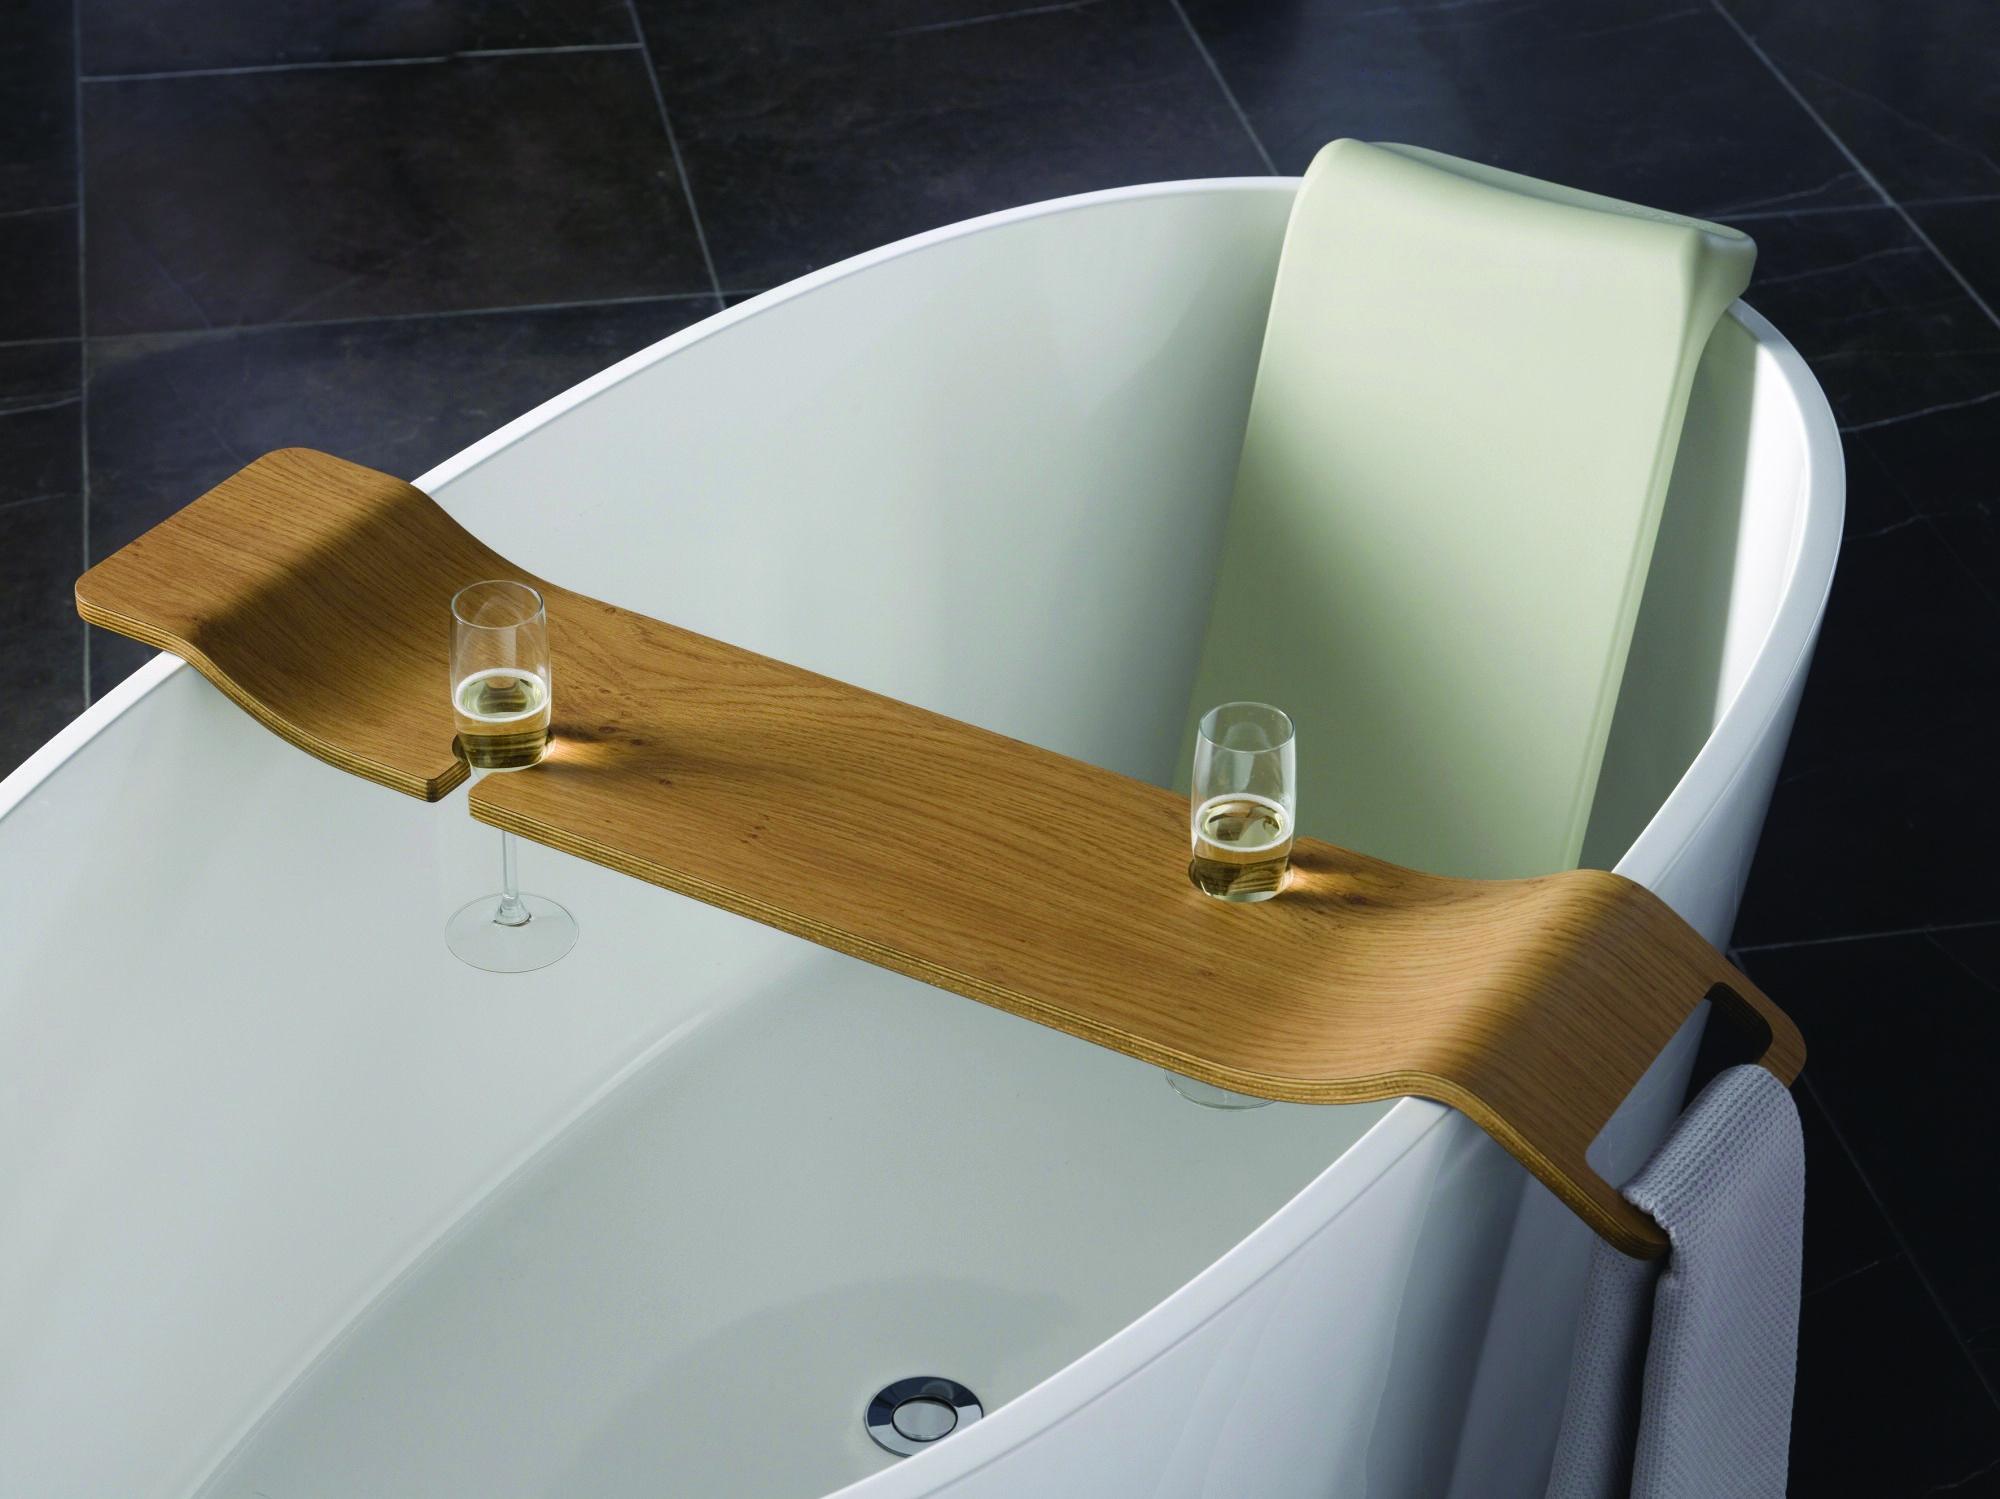 7 Of The Trendiest Bathroom Accessories Interiors Addict Bathtub Caddy Bunnings